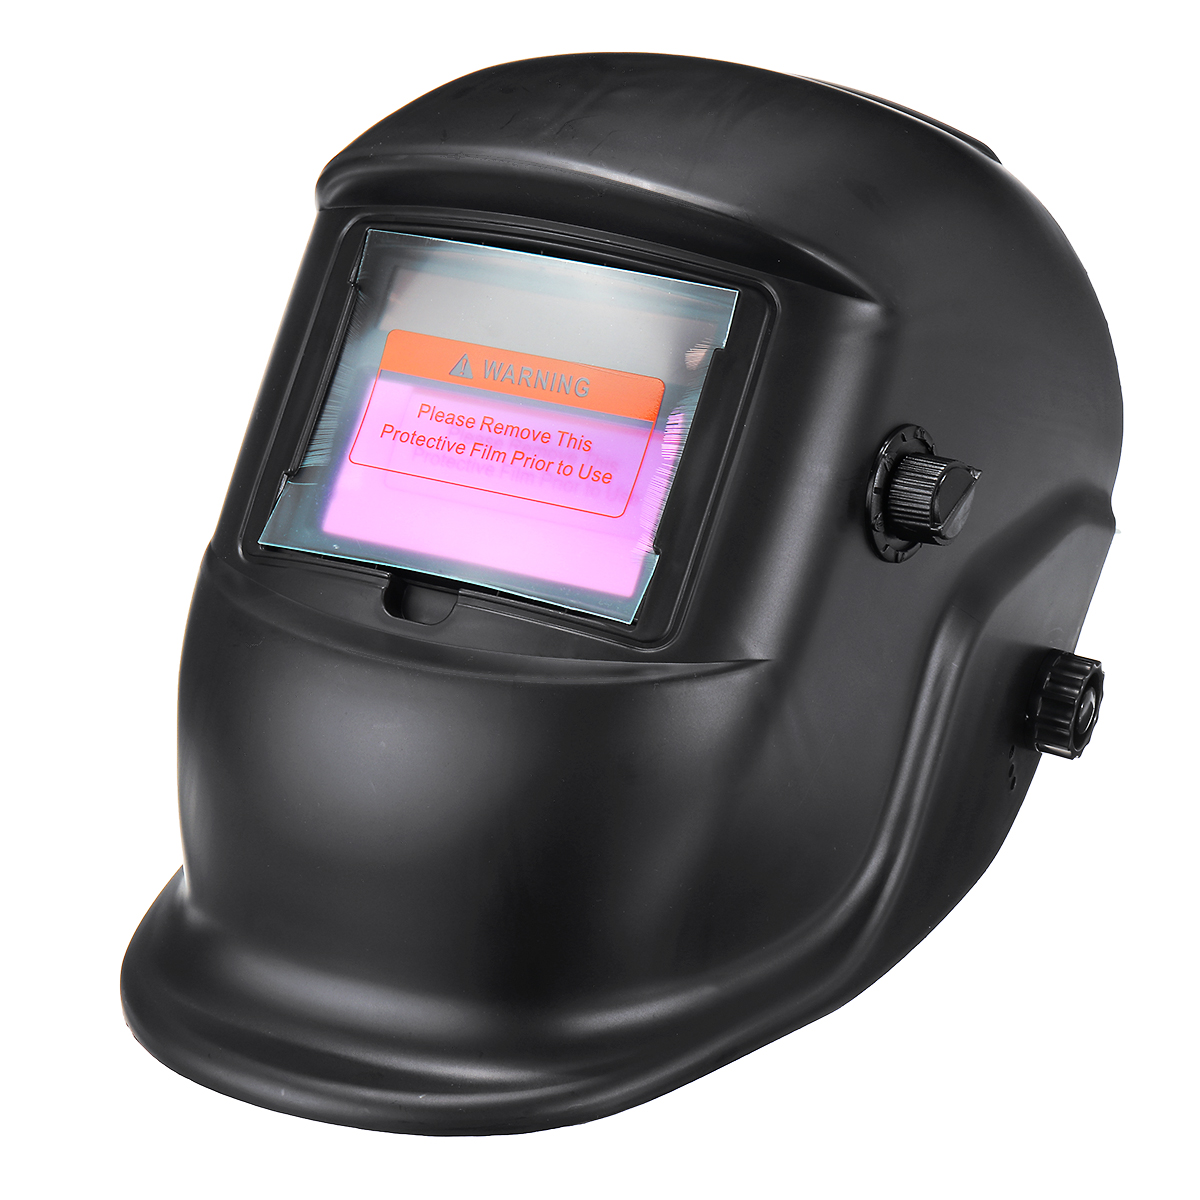 Big View Solar Auto Darkening Adjustable Shade Range 4/9-13 MIG ARC Electric Welding Mask Helmets Cap Welder Protective Gear